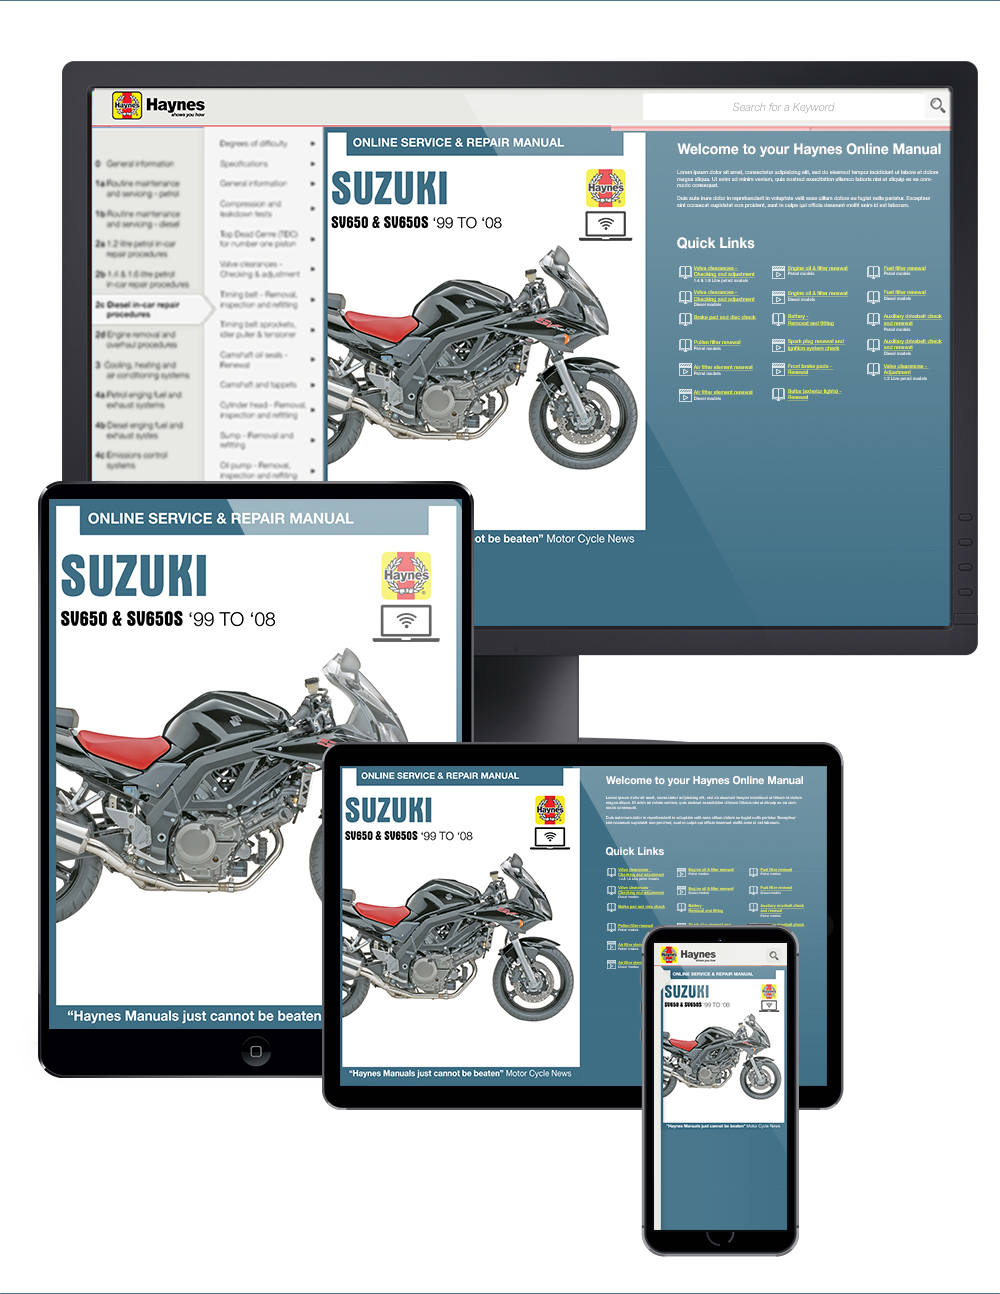 Suzuki SV650 & SV650S (99-08) Haynes Online Manual